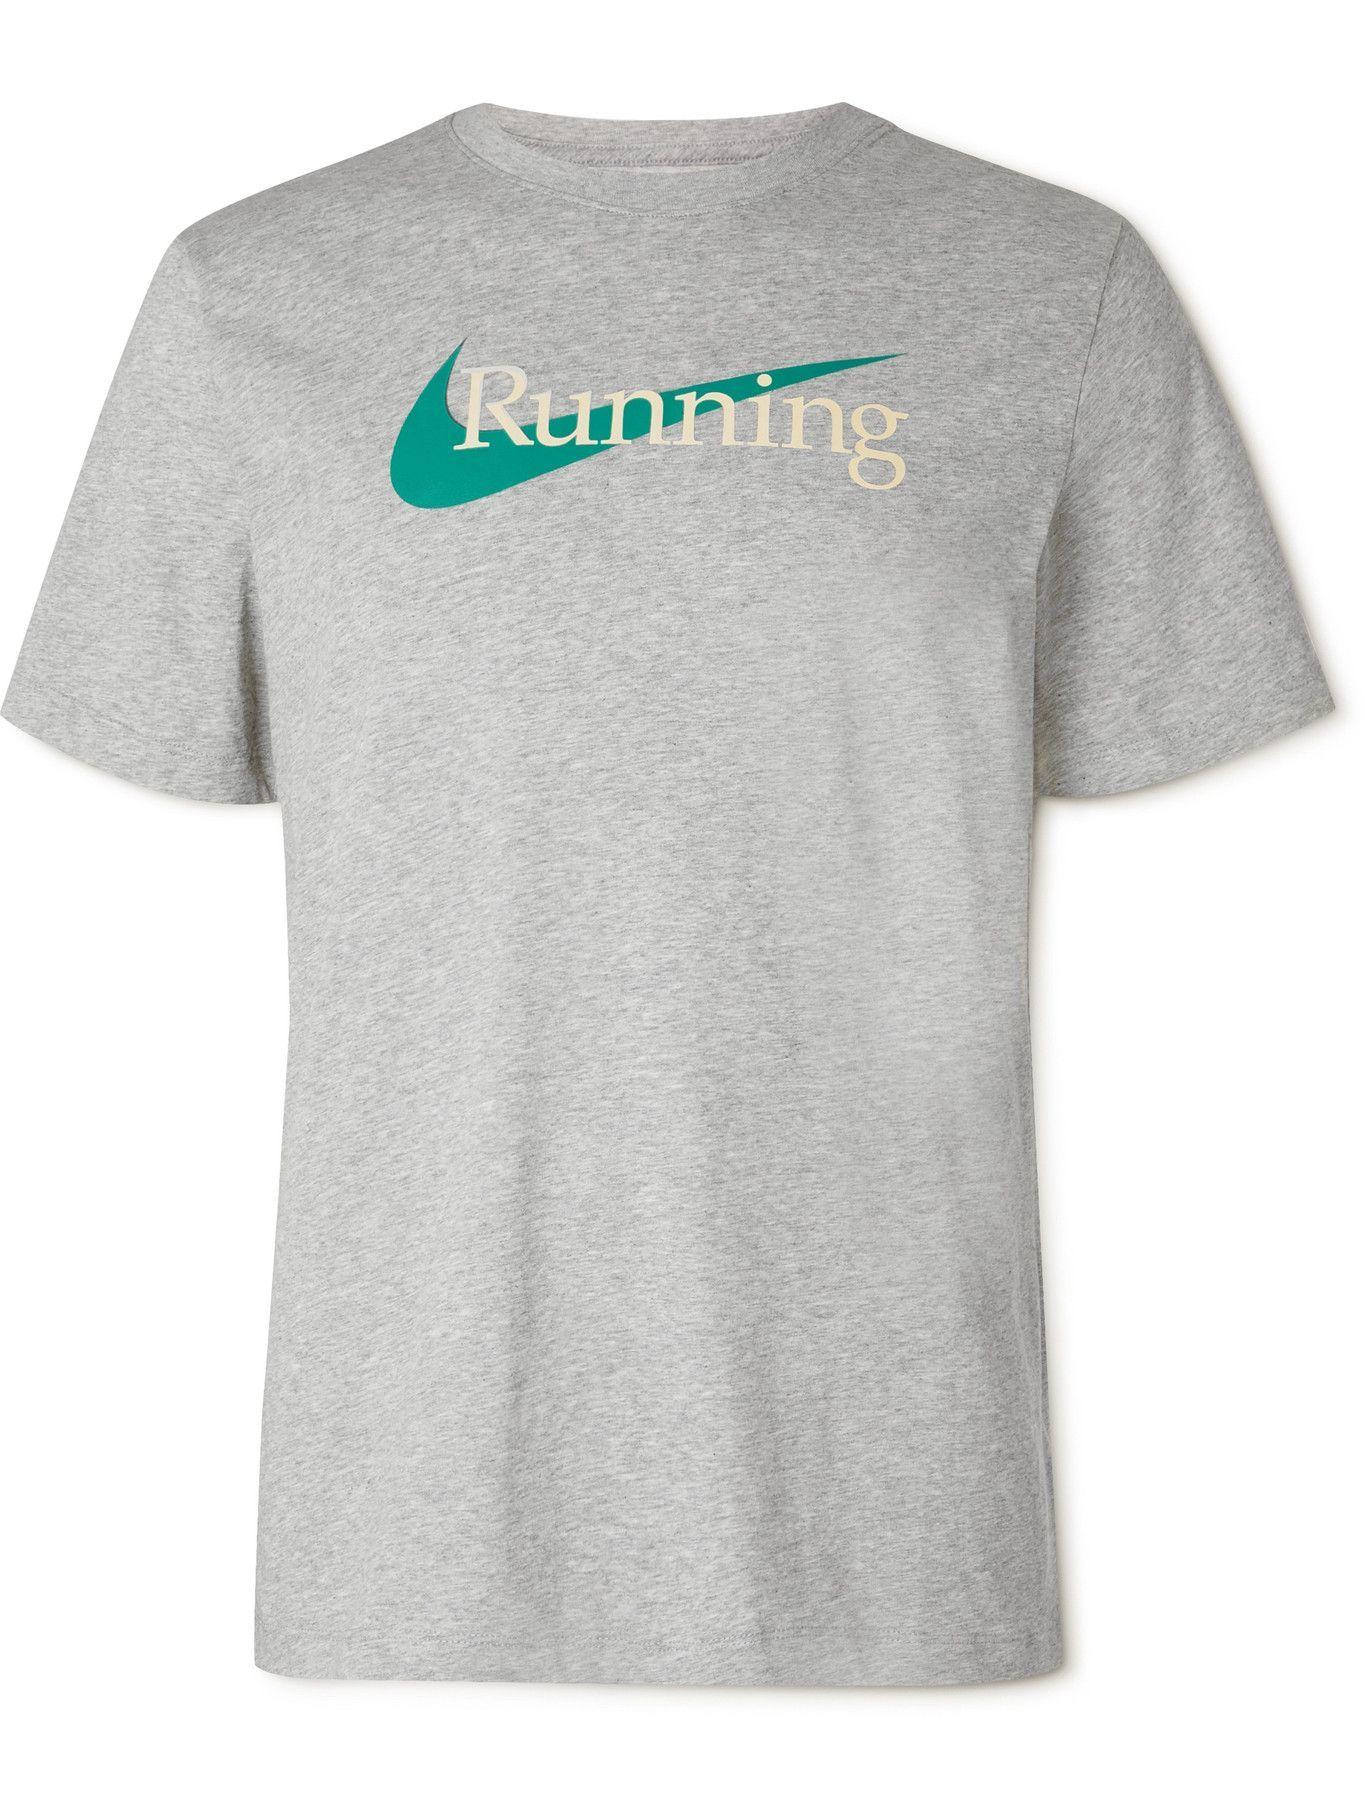 NIKE RUNNING - Logo-Print Mélange Dri-FIT Jersey T-Shirt - Gray